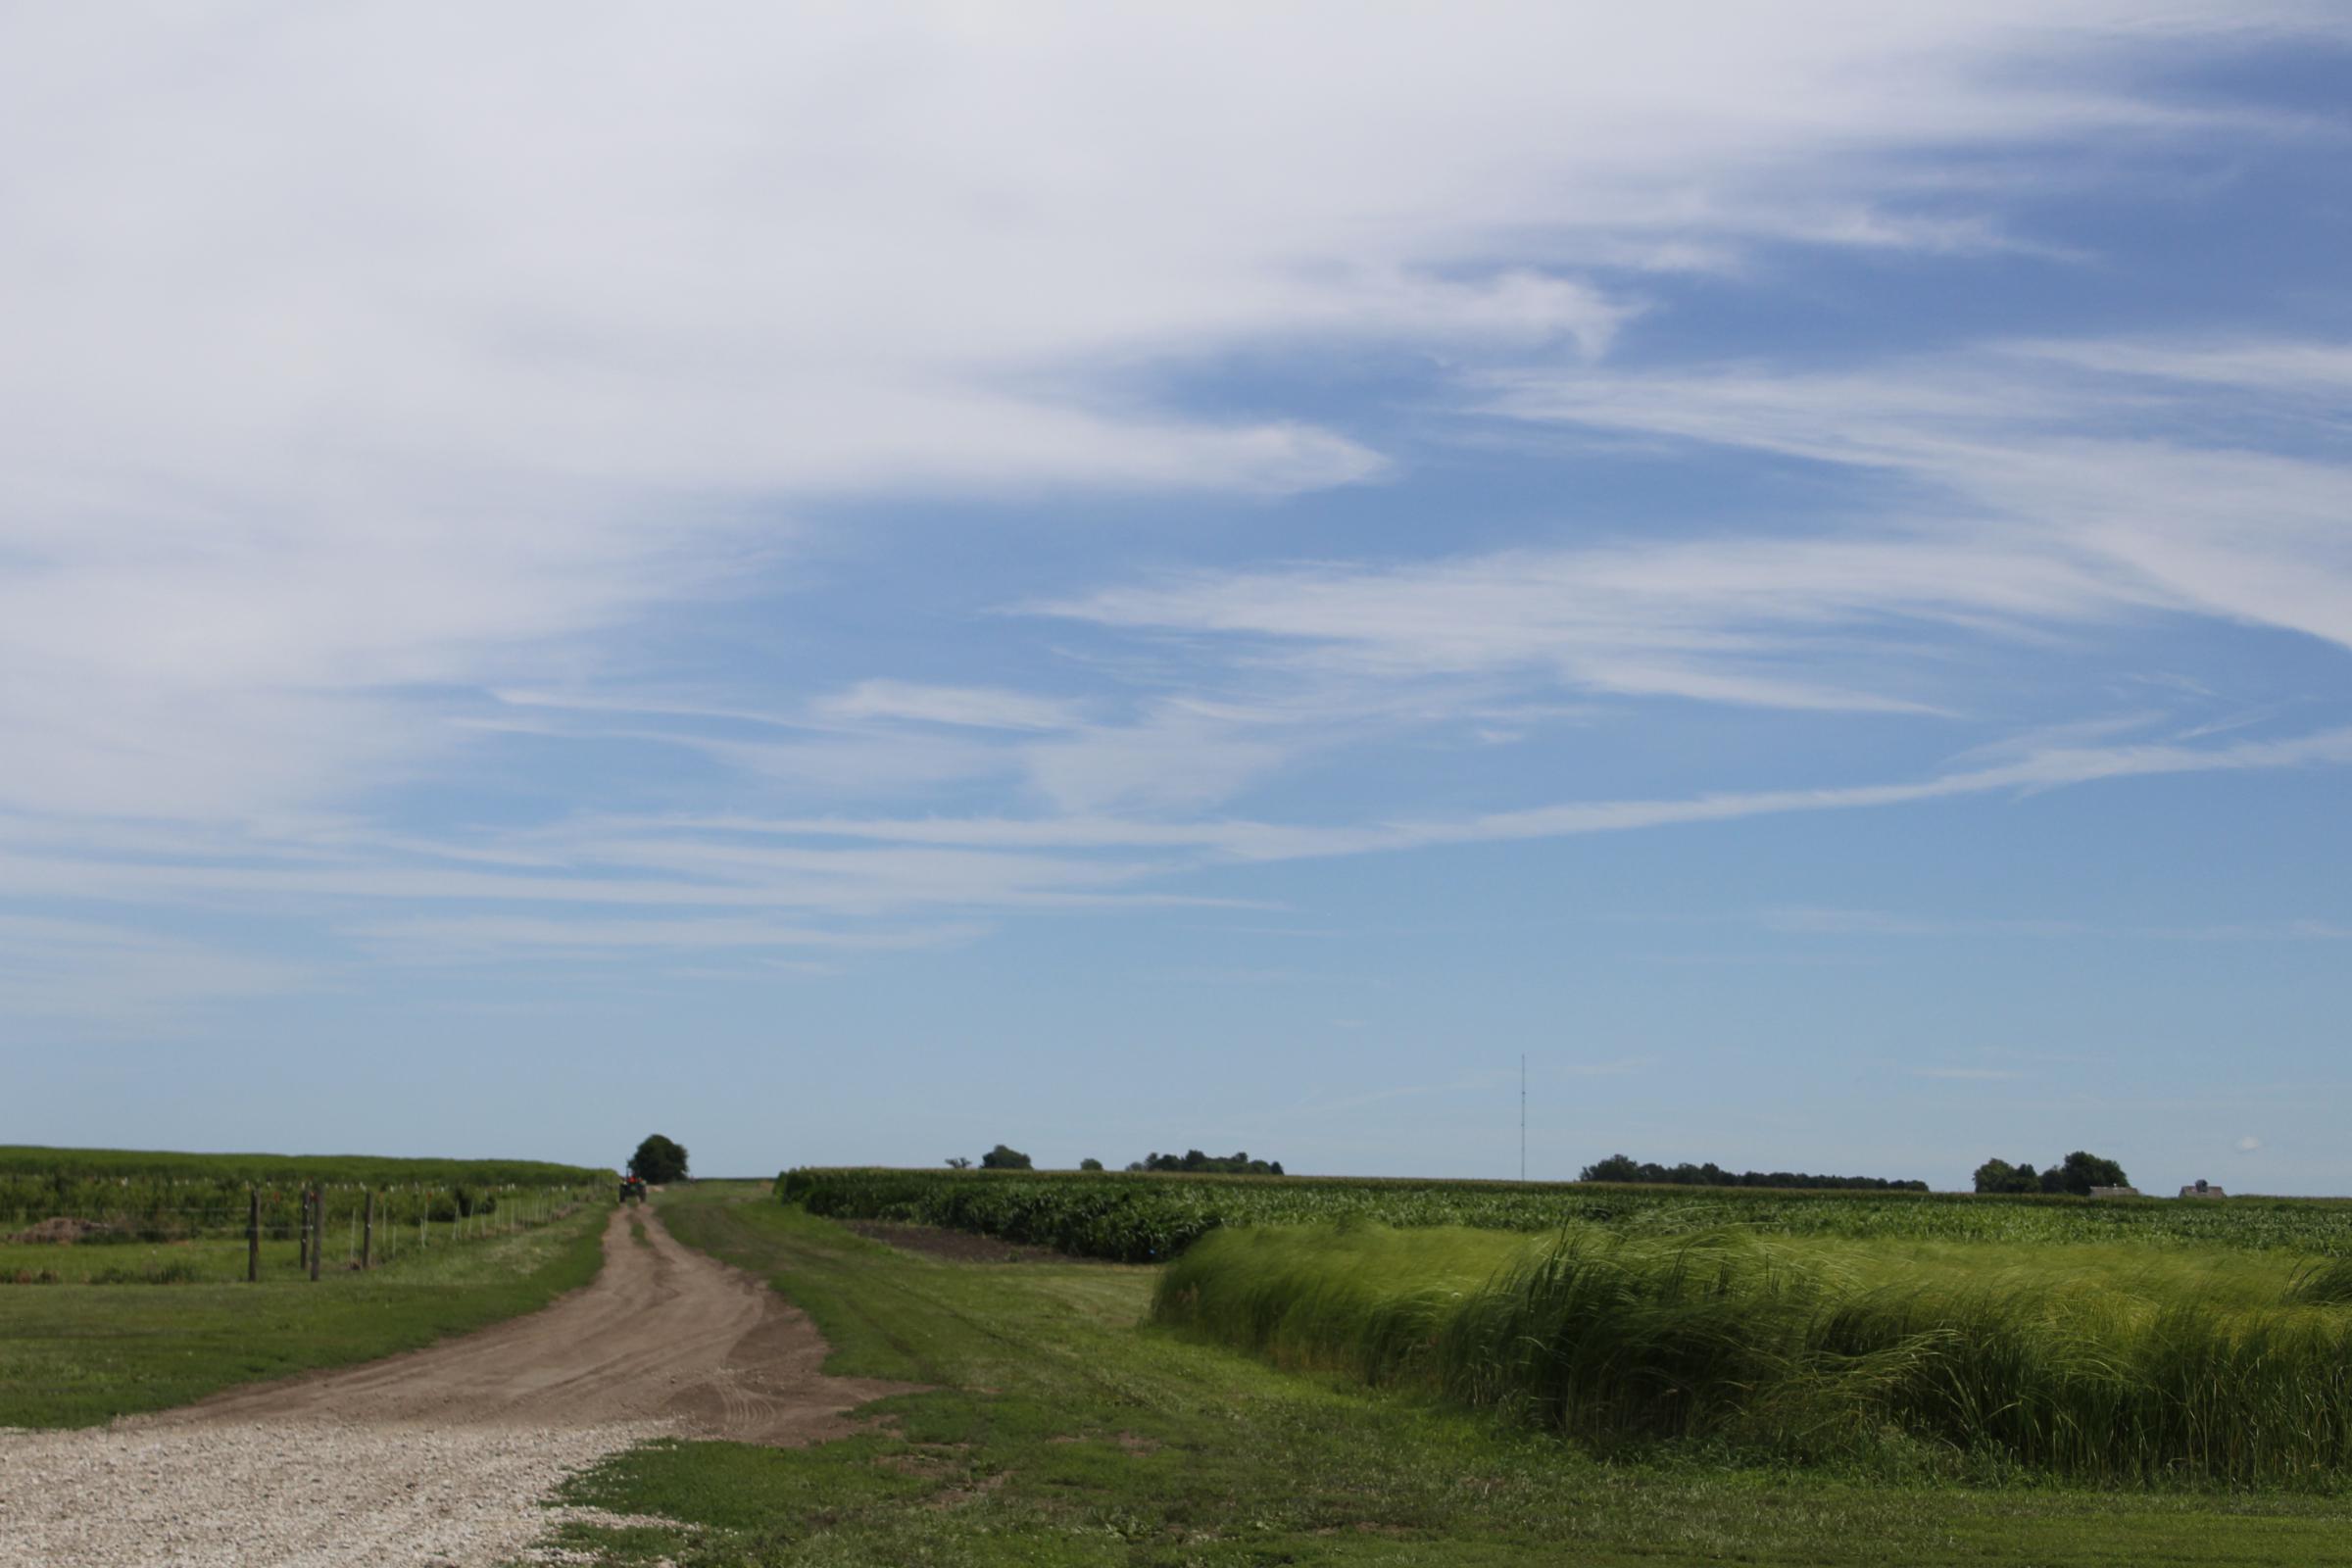 The University of Illinois Energy Farm, just south of Urbana.